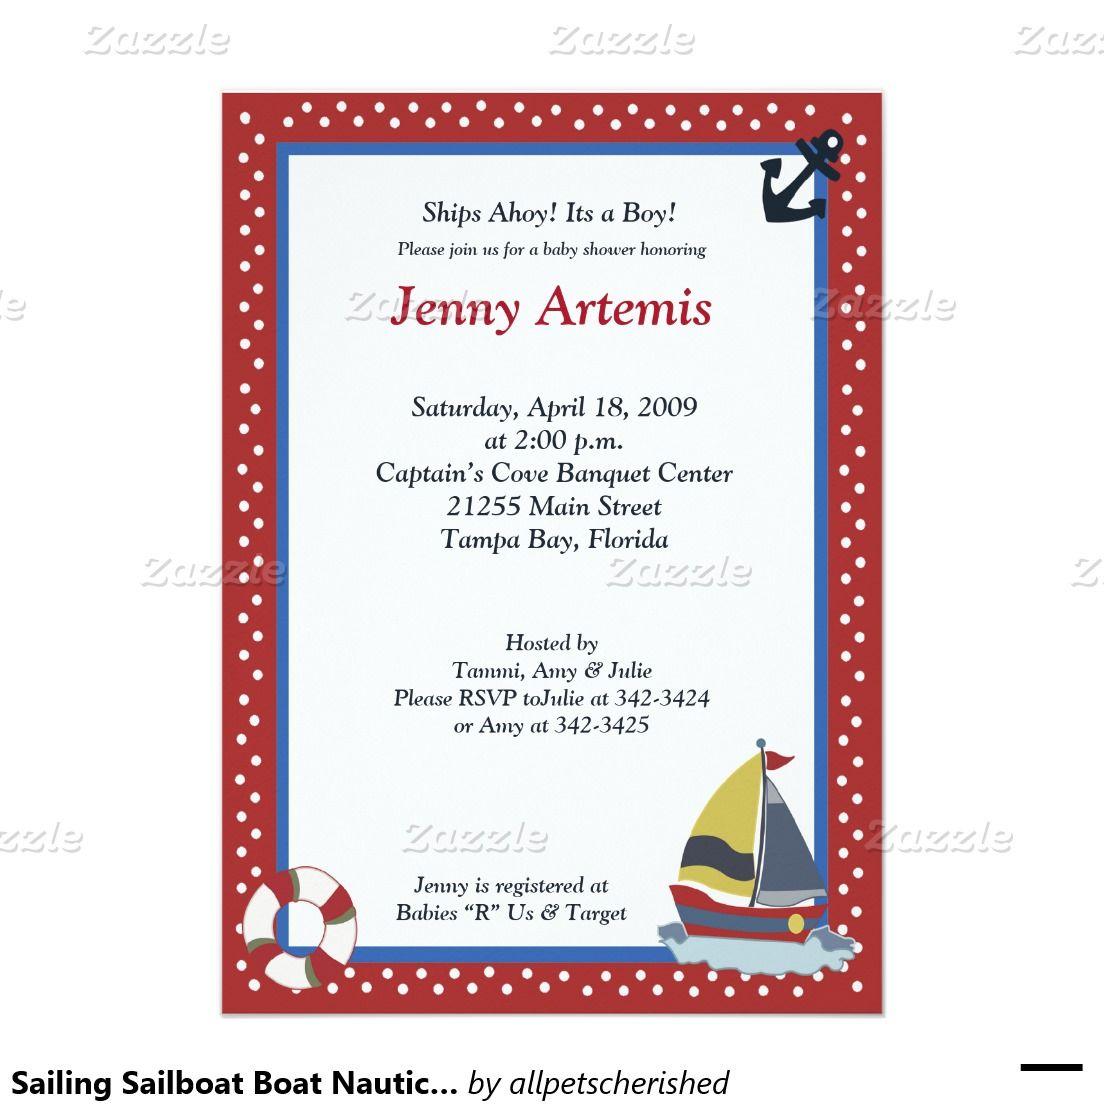 Sailing Sailboat Boat Nautical Baby Shower 5x7 5x7 Paper Invitation Card